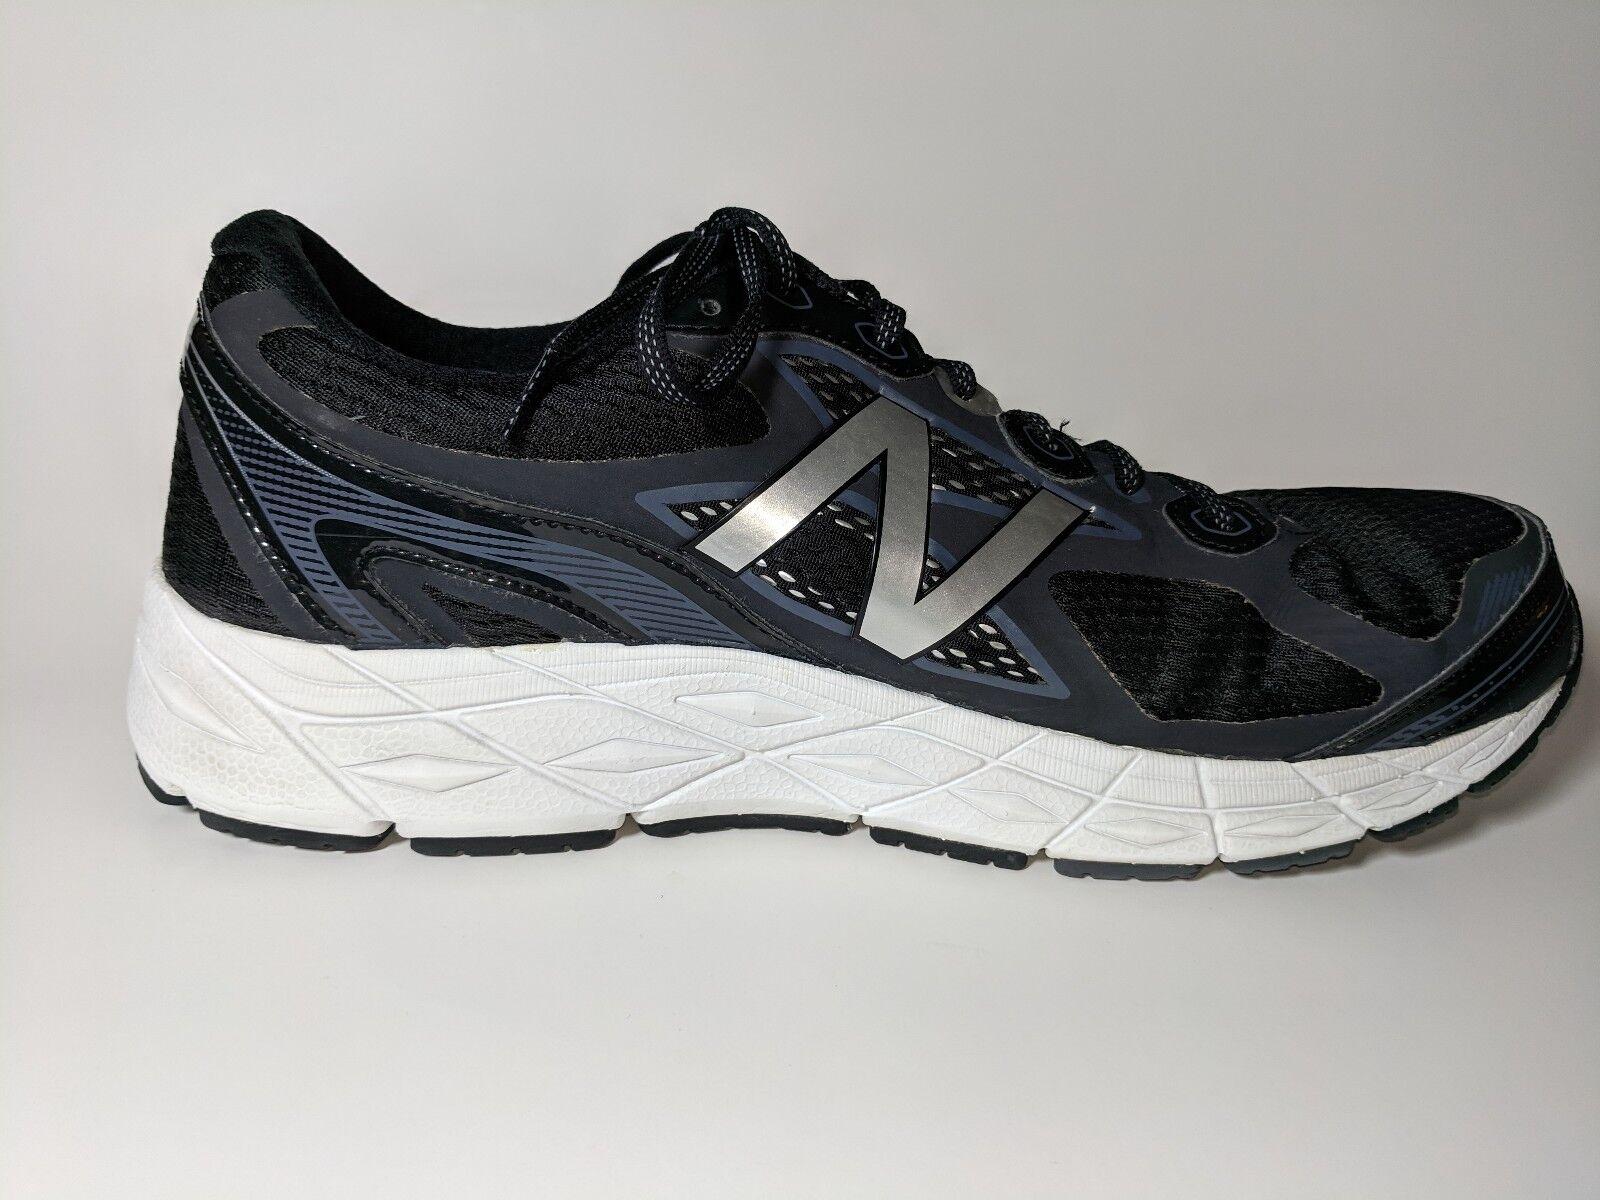 New Balance 840 v3 Men's Athletic shoes Sz 14 EUC